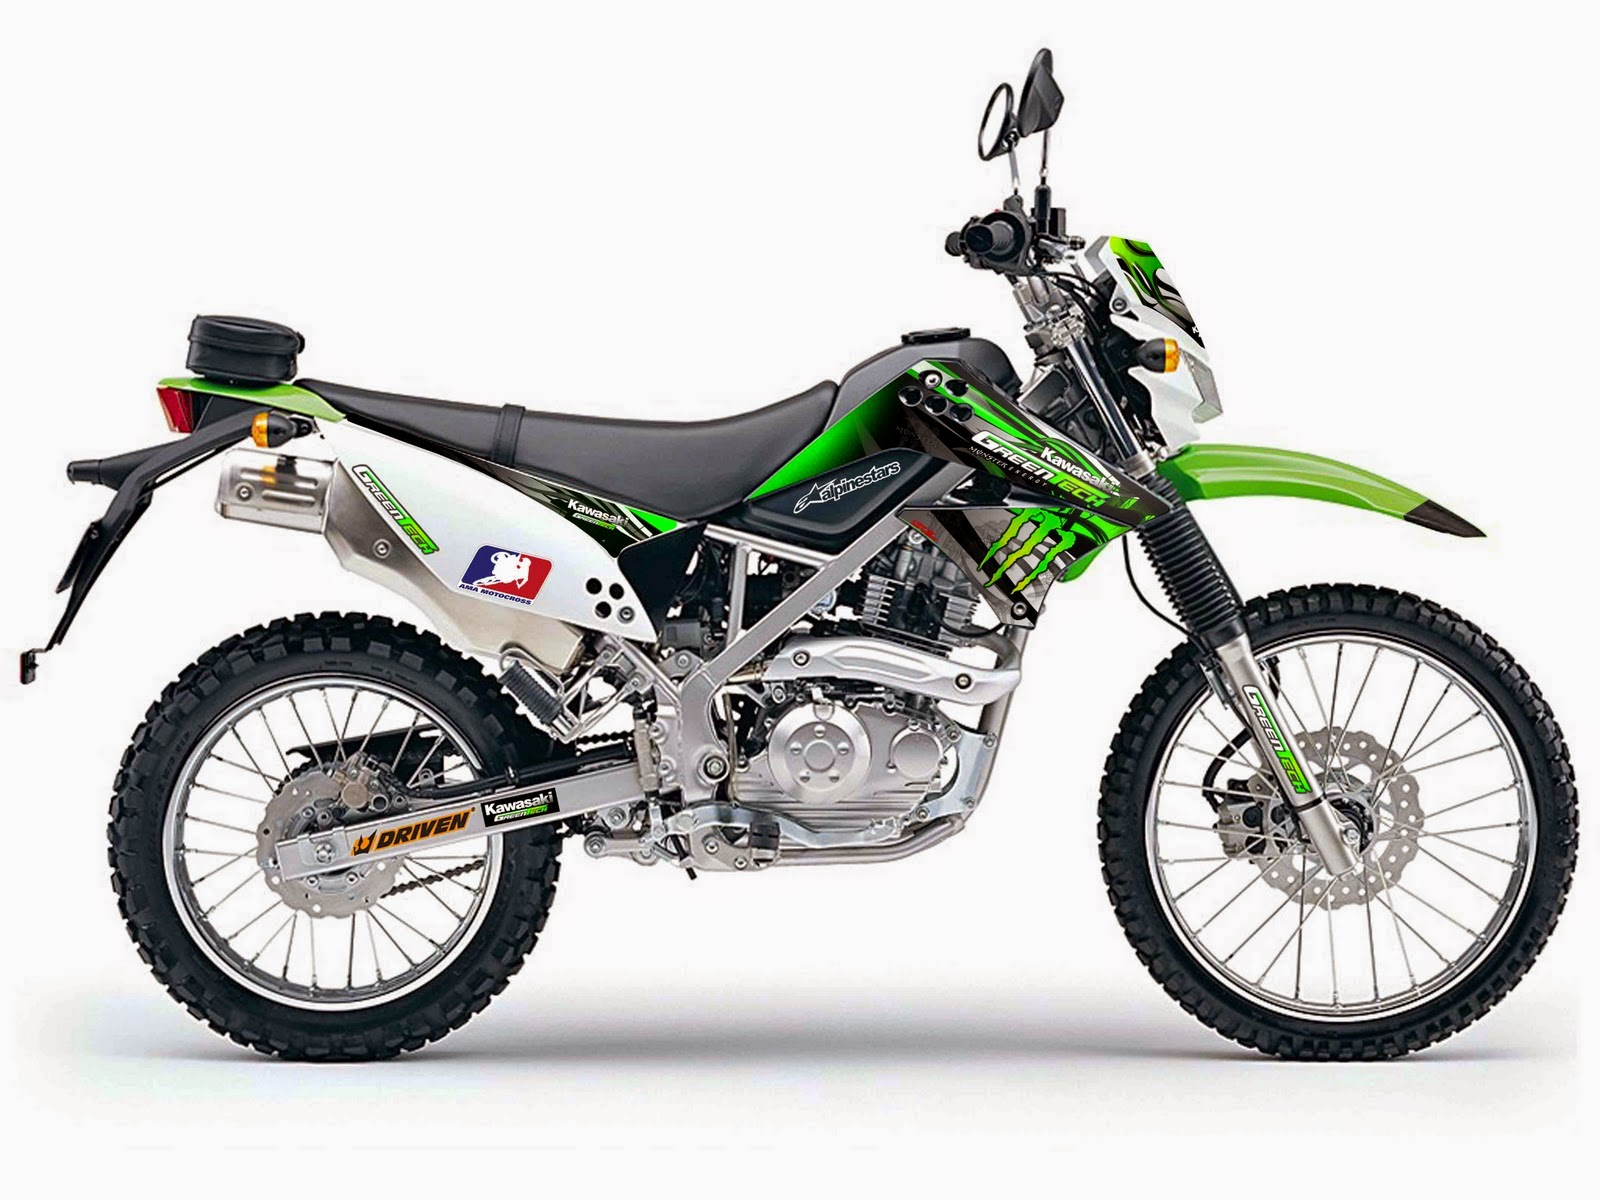 Modifikasi Motor Kawasaki klx